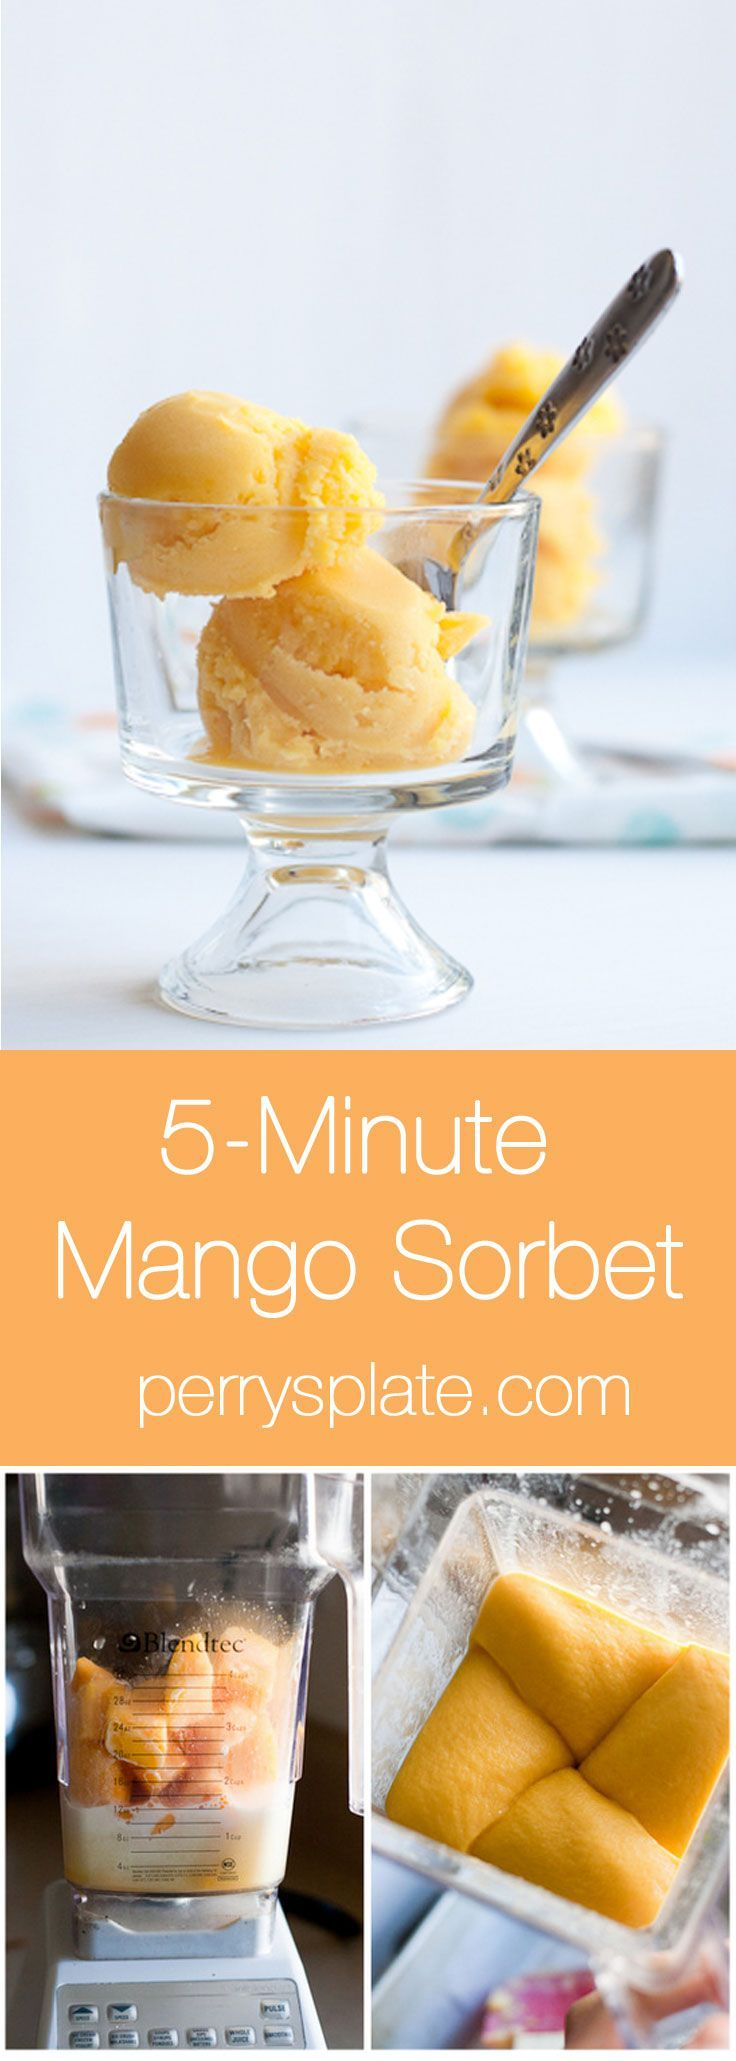 Fast and Easy Mango Sorbet you can make in a blender!   mango recipes   paleo dessert recipes   perrysplate.com